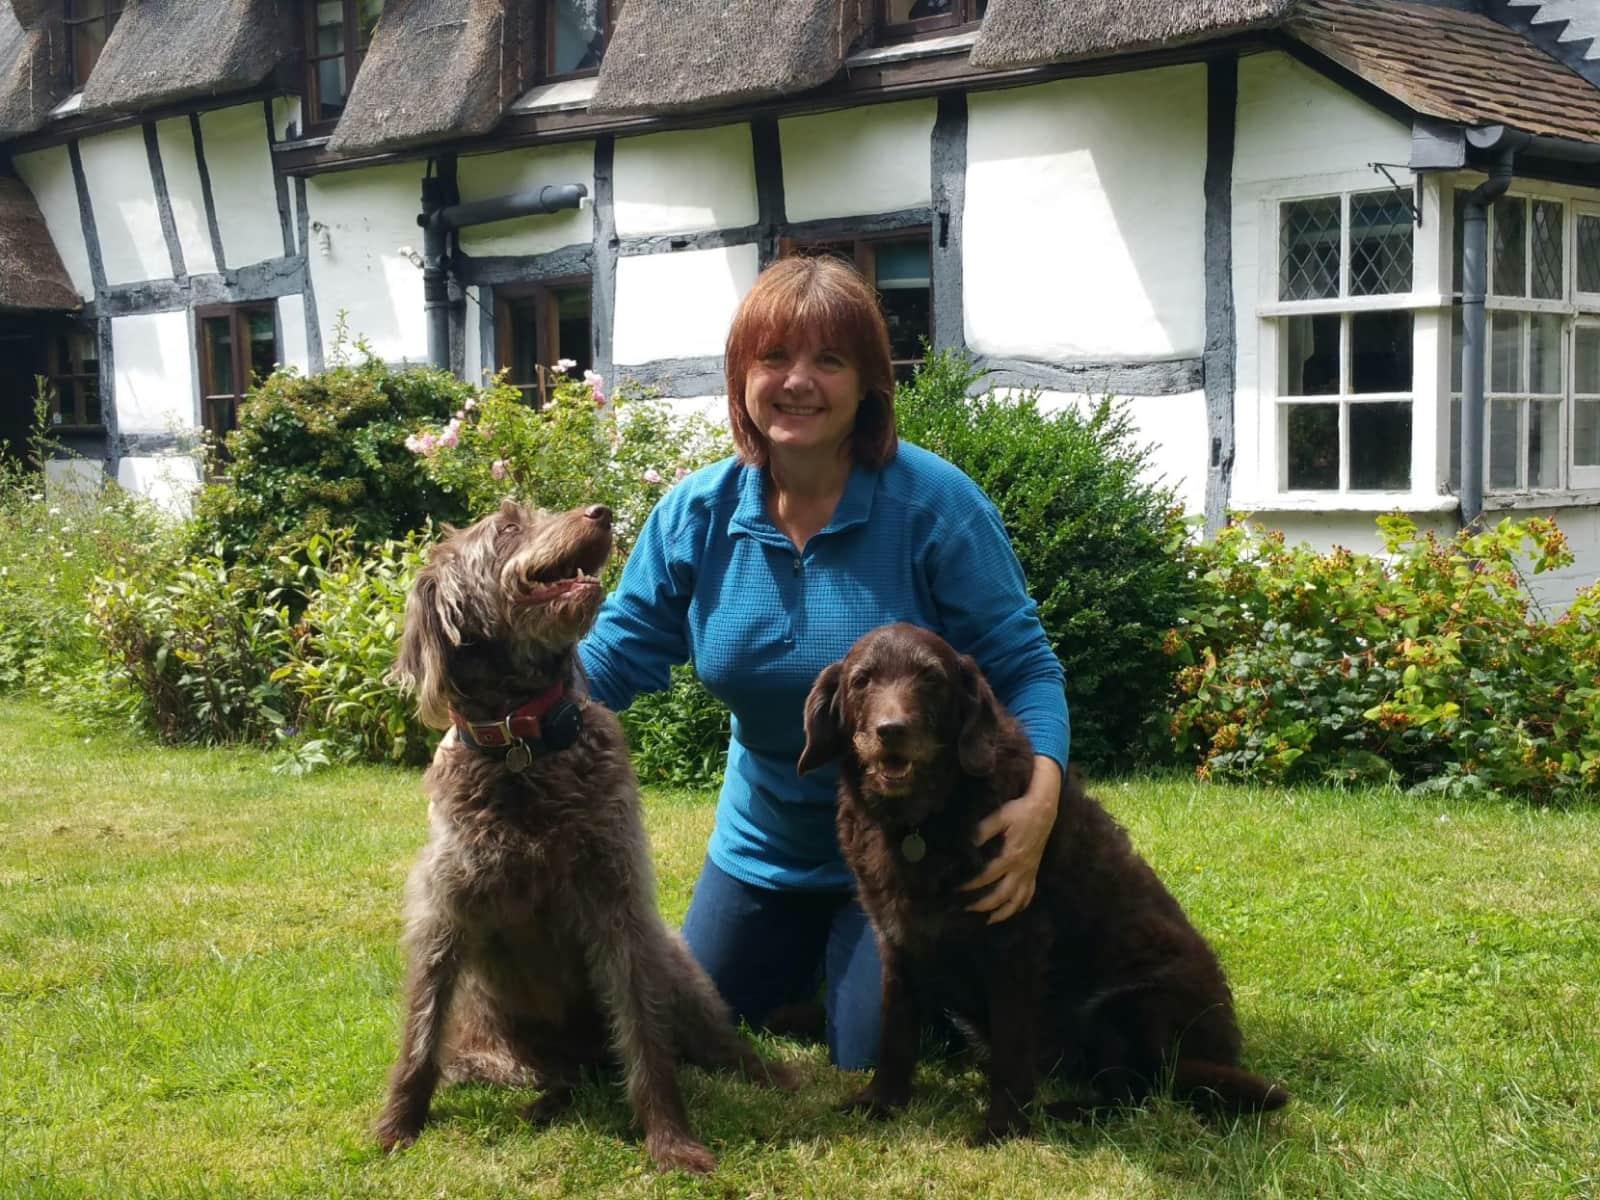 Anne from Great Malvern, United Kingdom